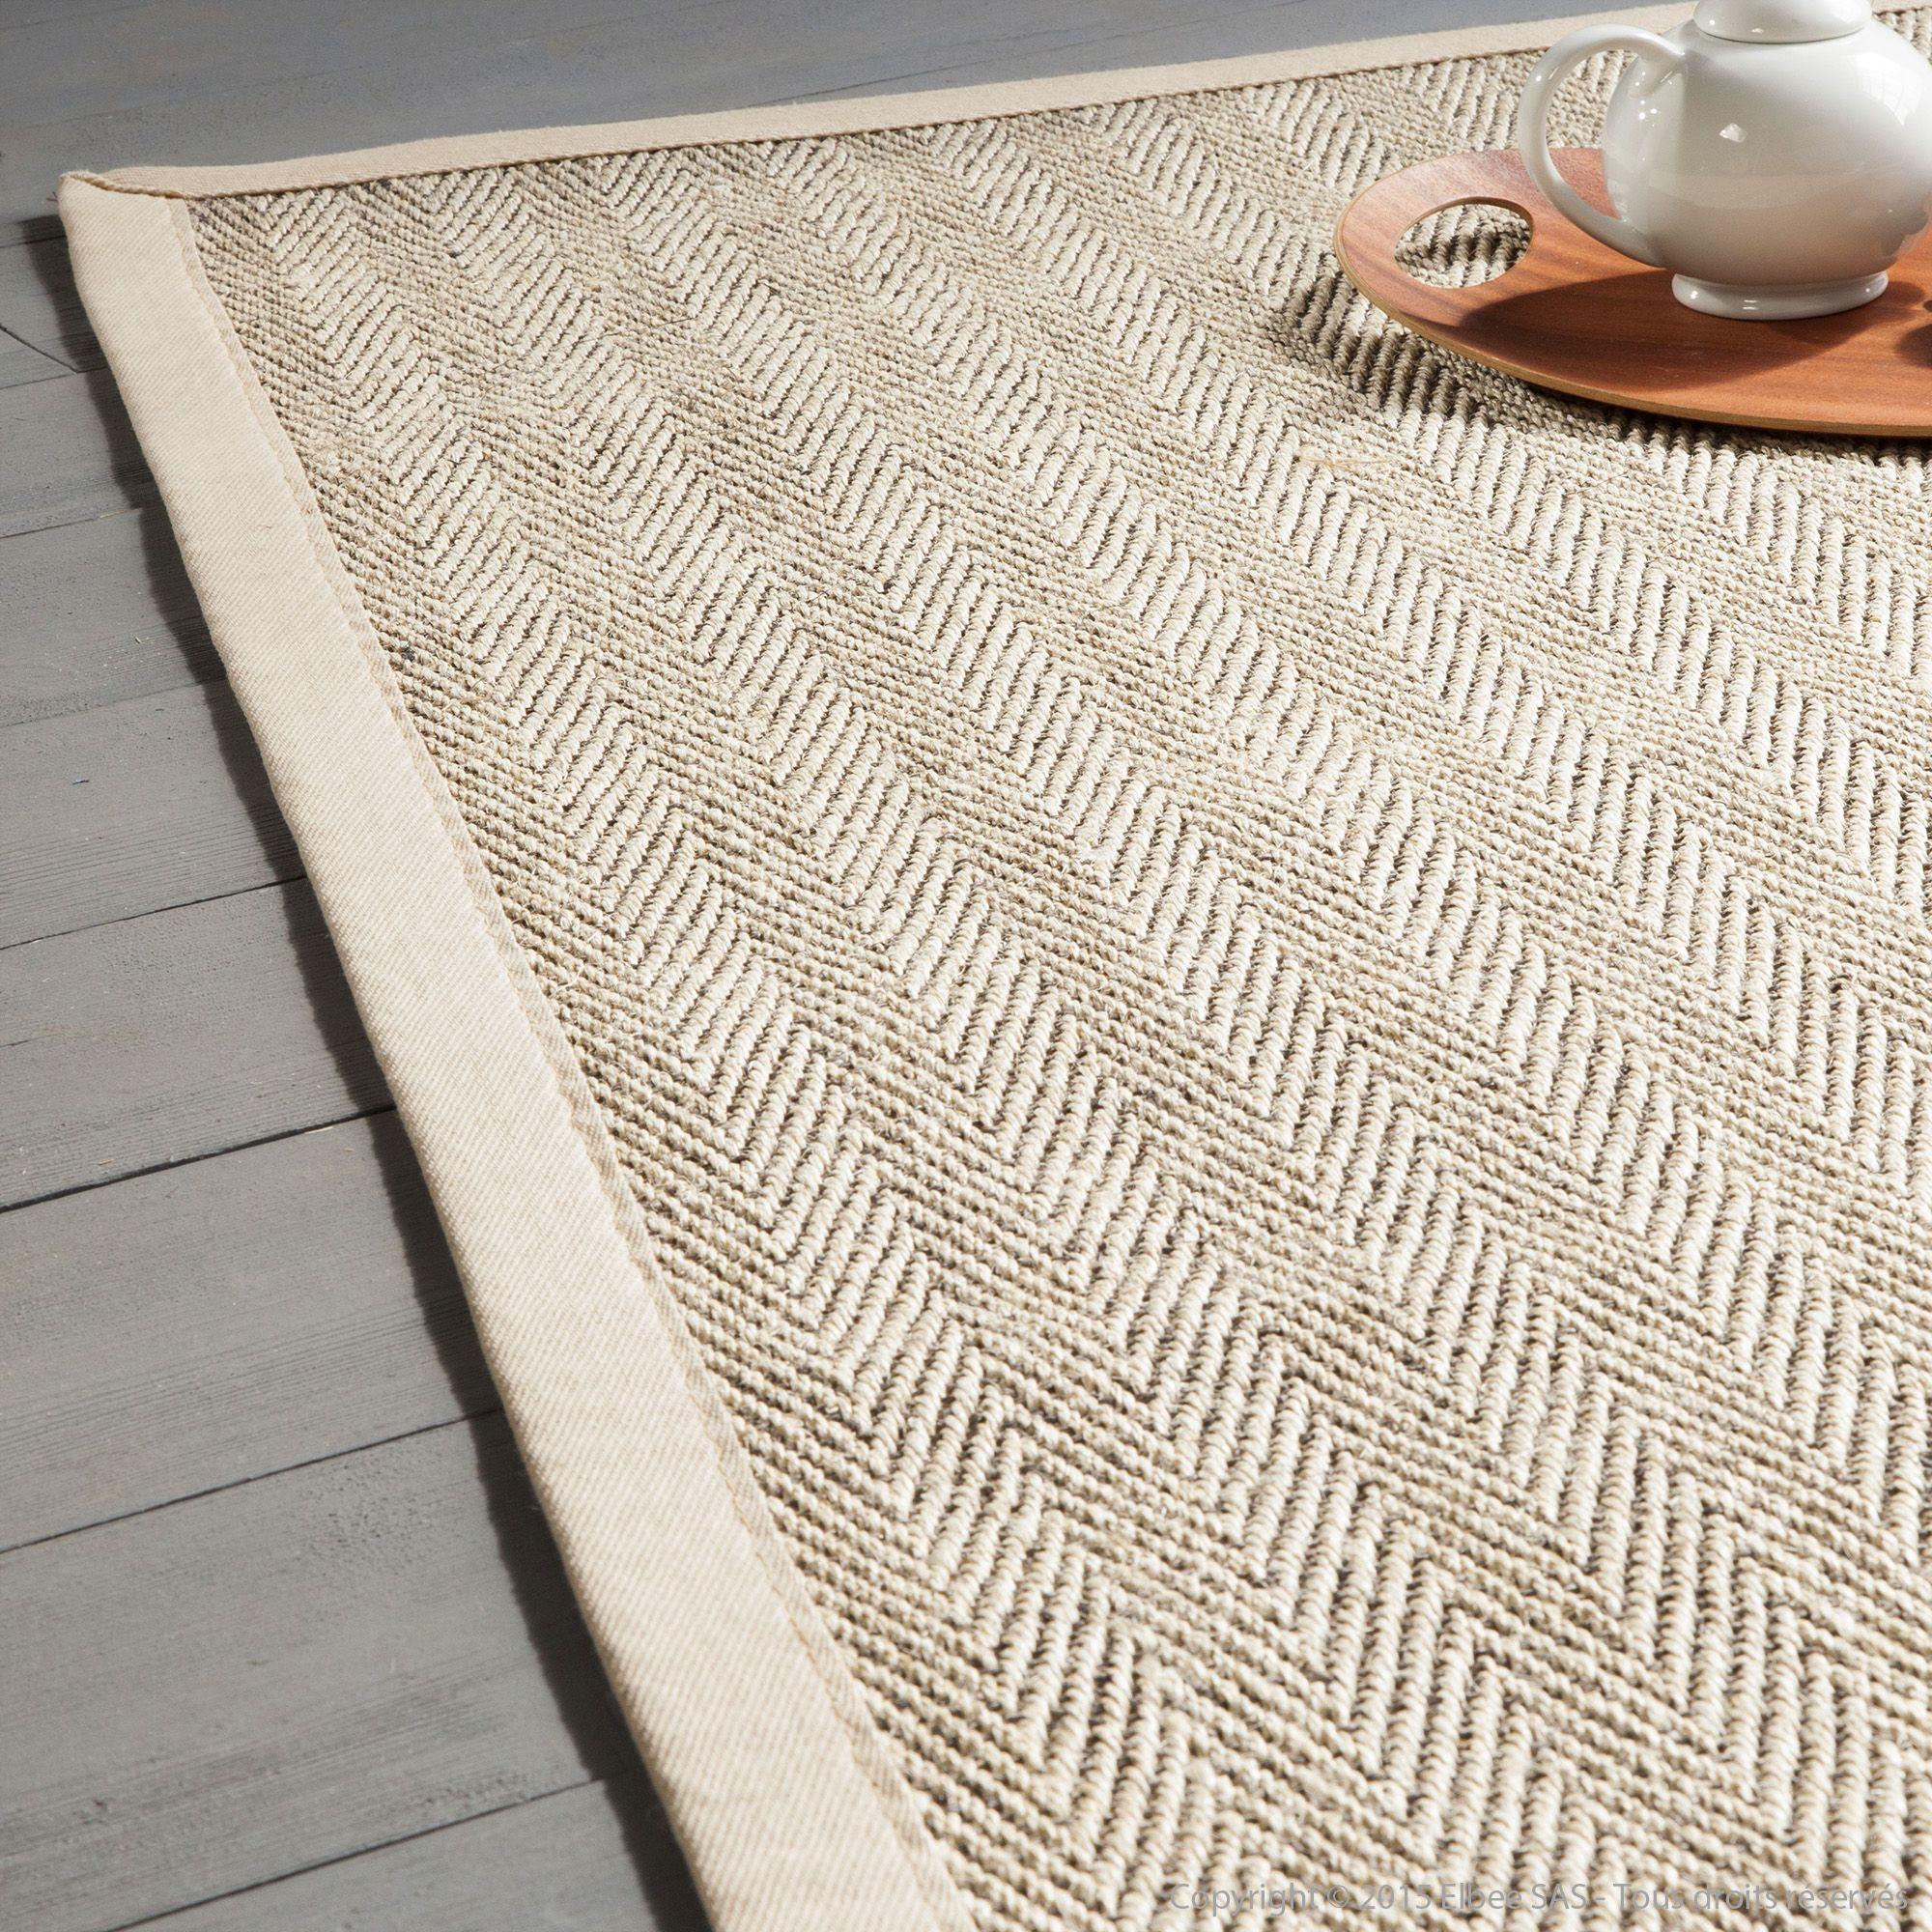 tapis sisal bicolore chevrons avec ganse en coton millstone - Tapis Sisal